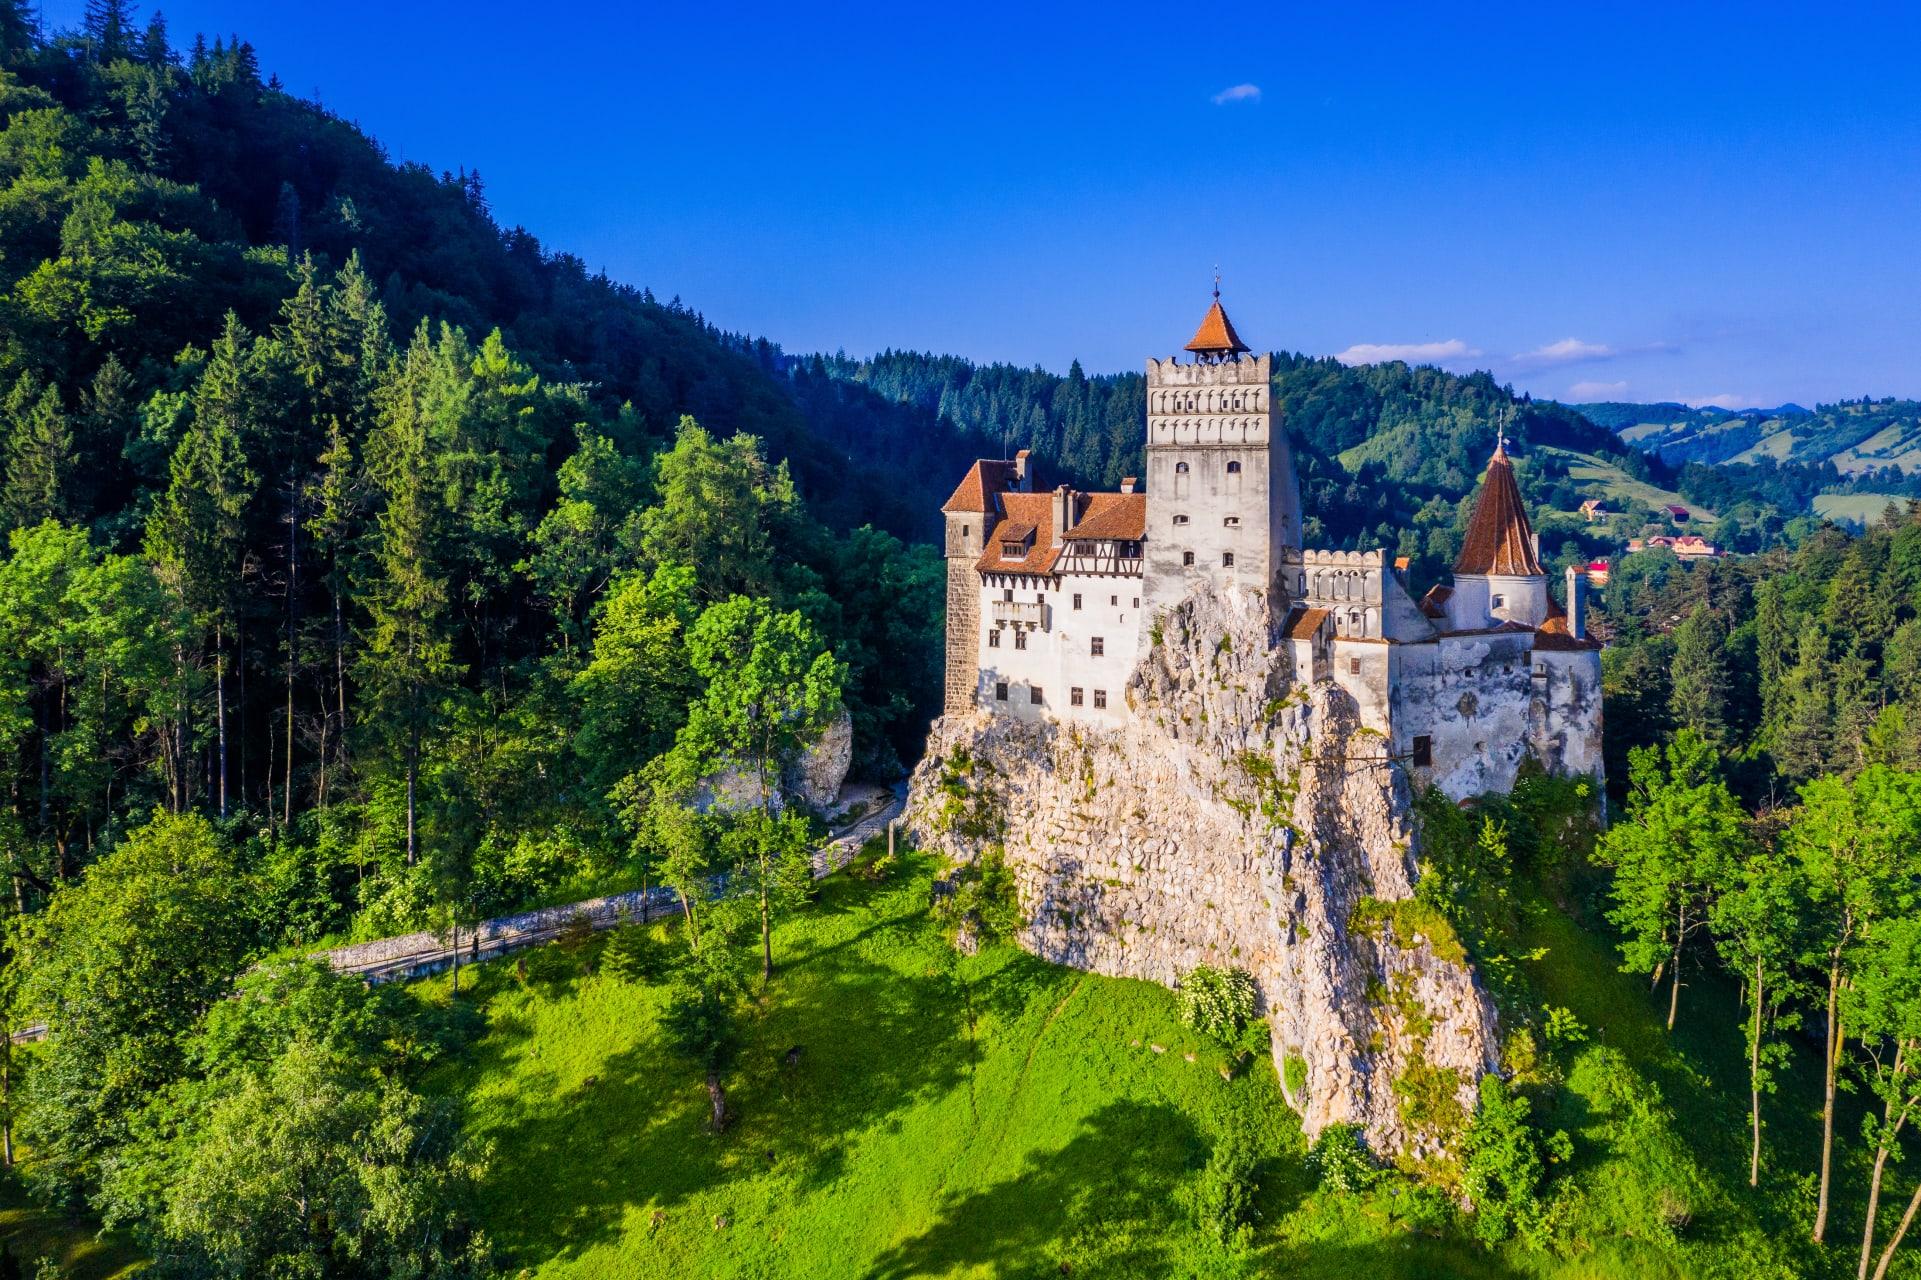 Transylvania - Haunted by Dracula - the Bran Castle